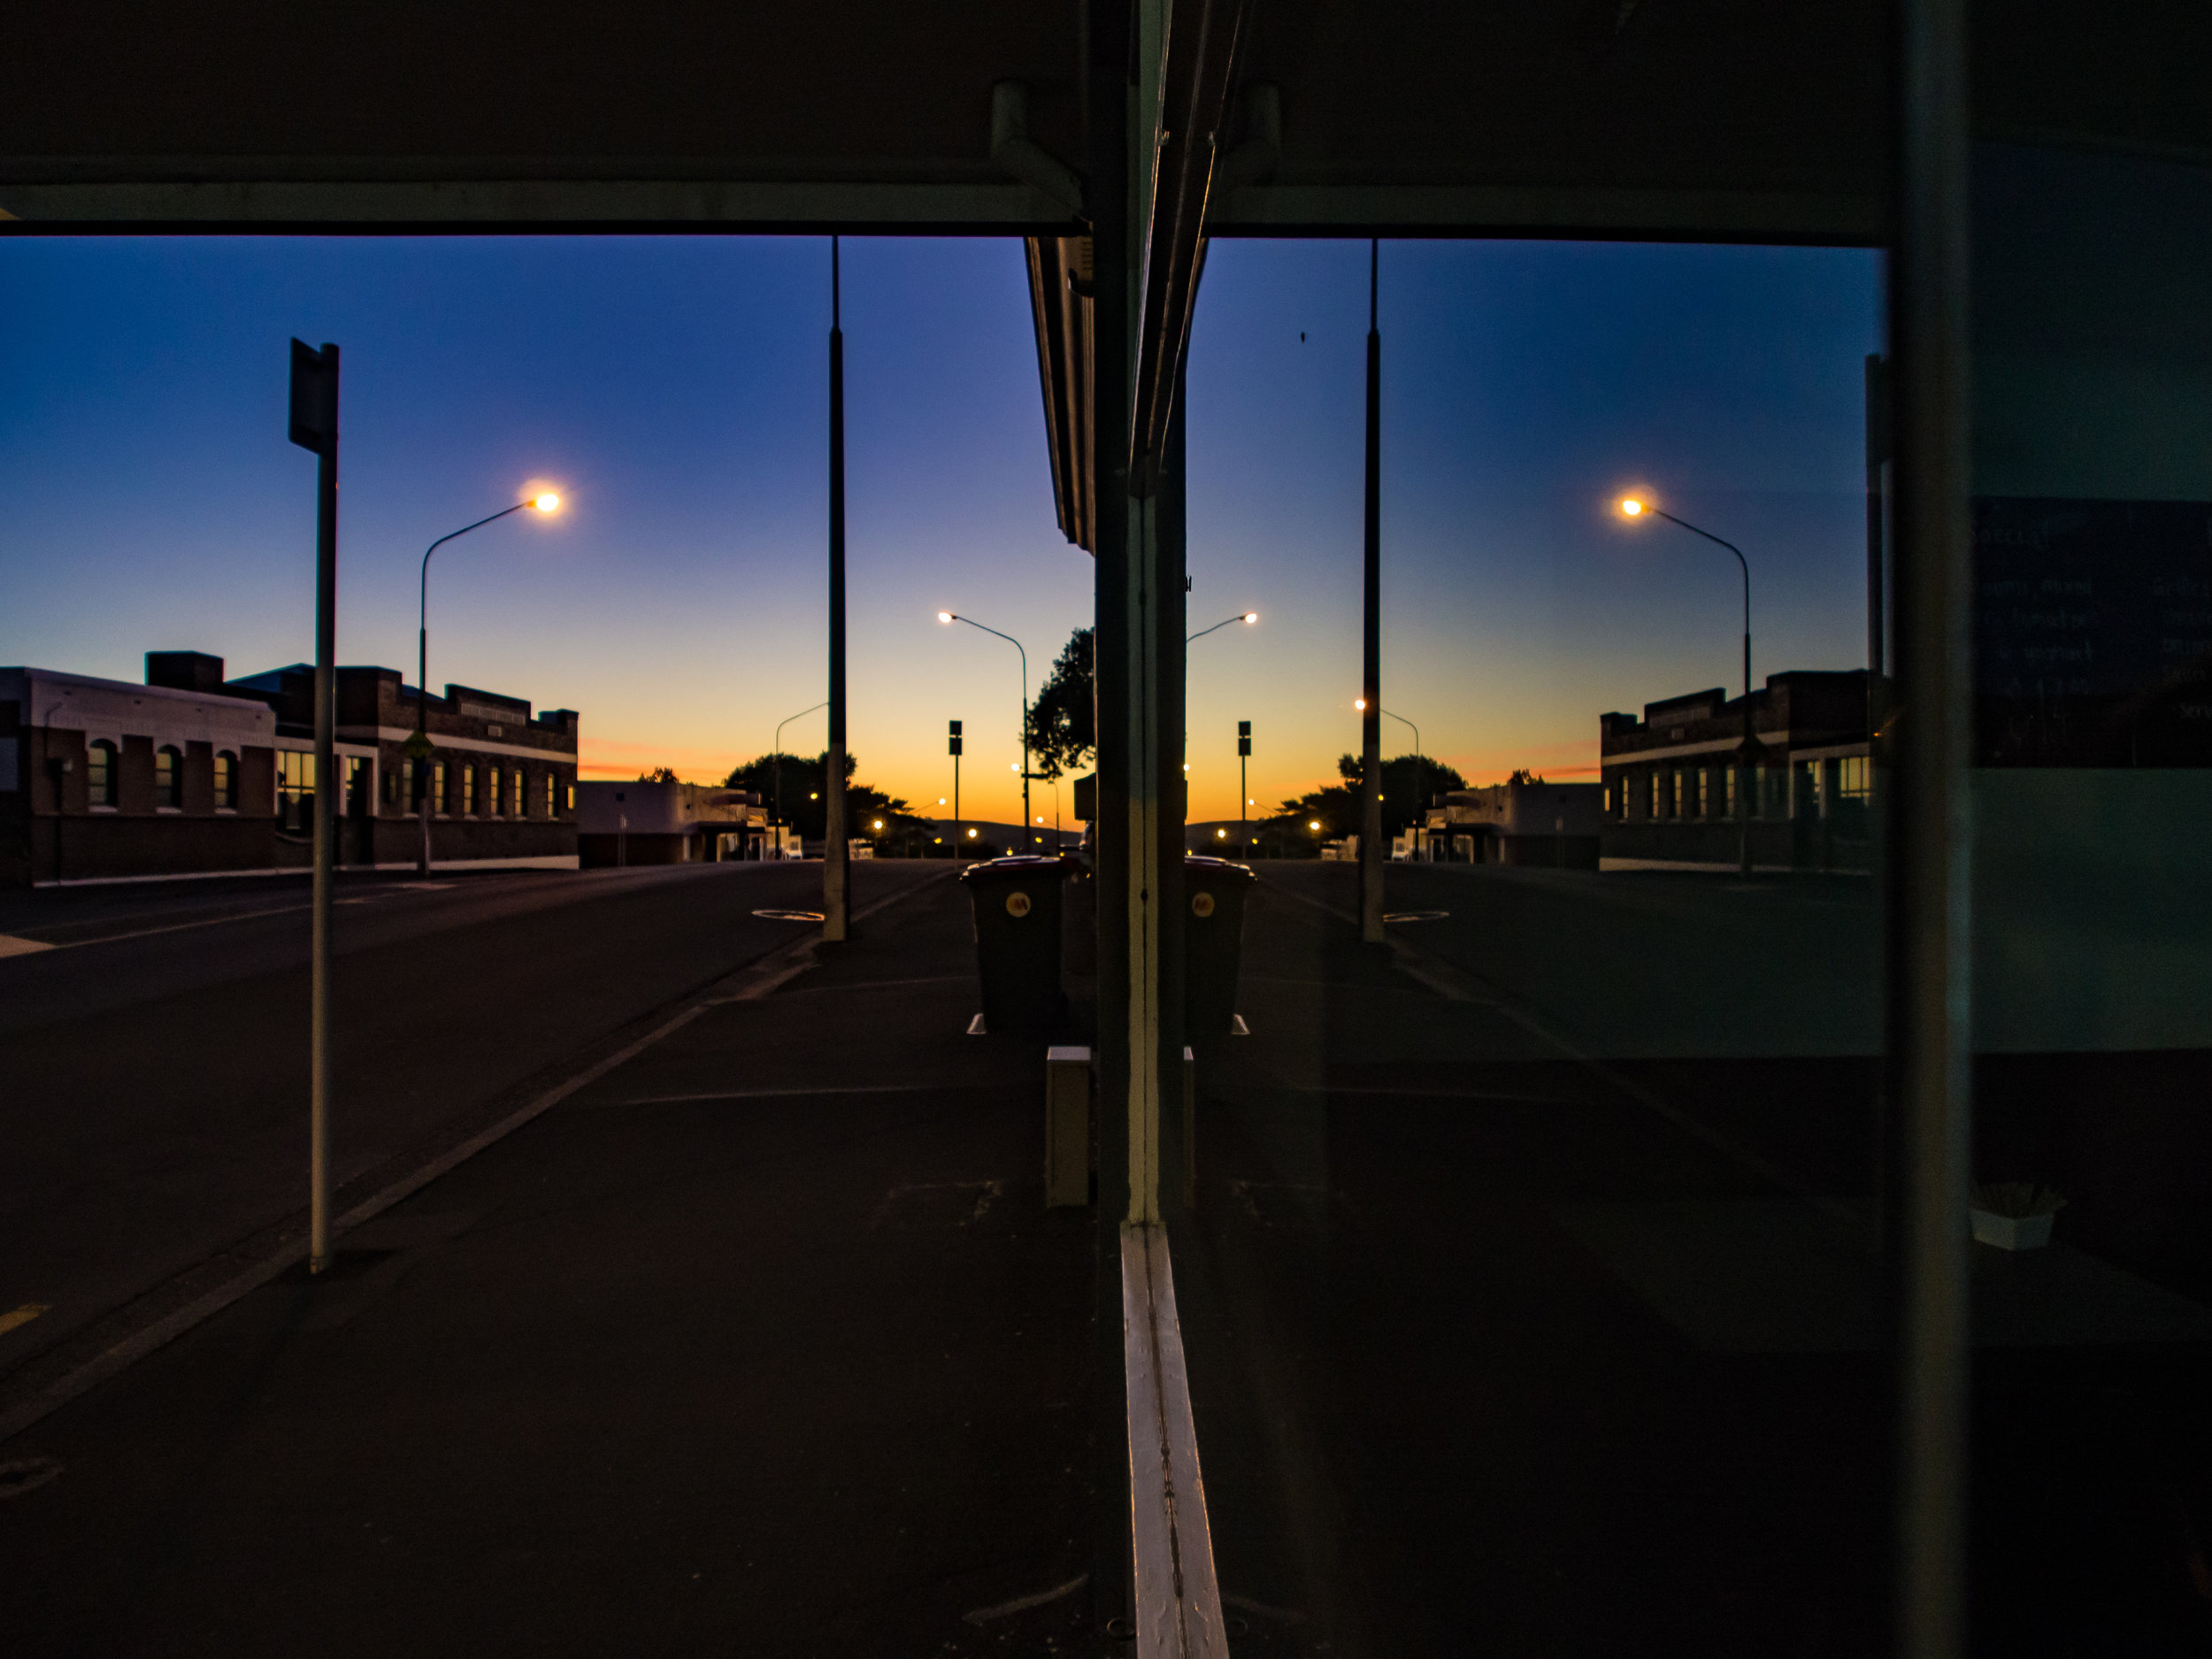 Sunrise window reflection at Alto cafe in Dunedin